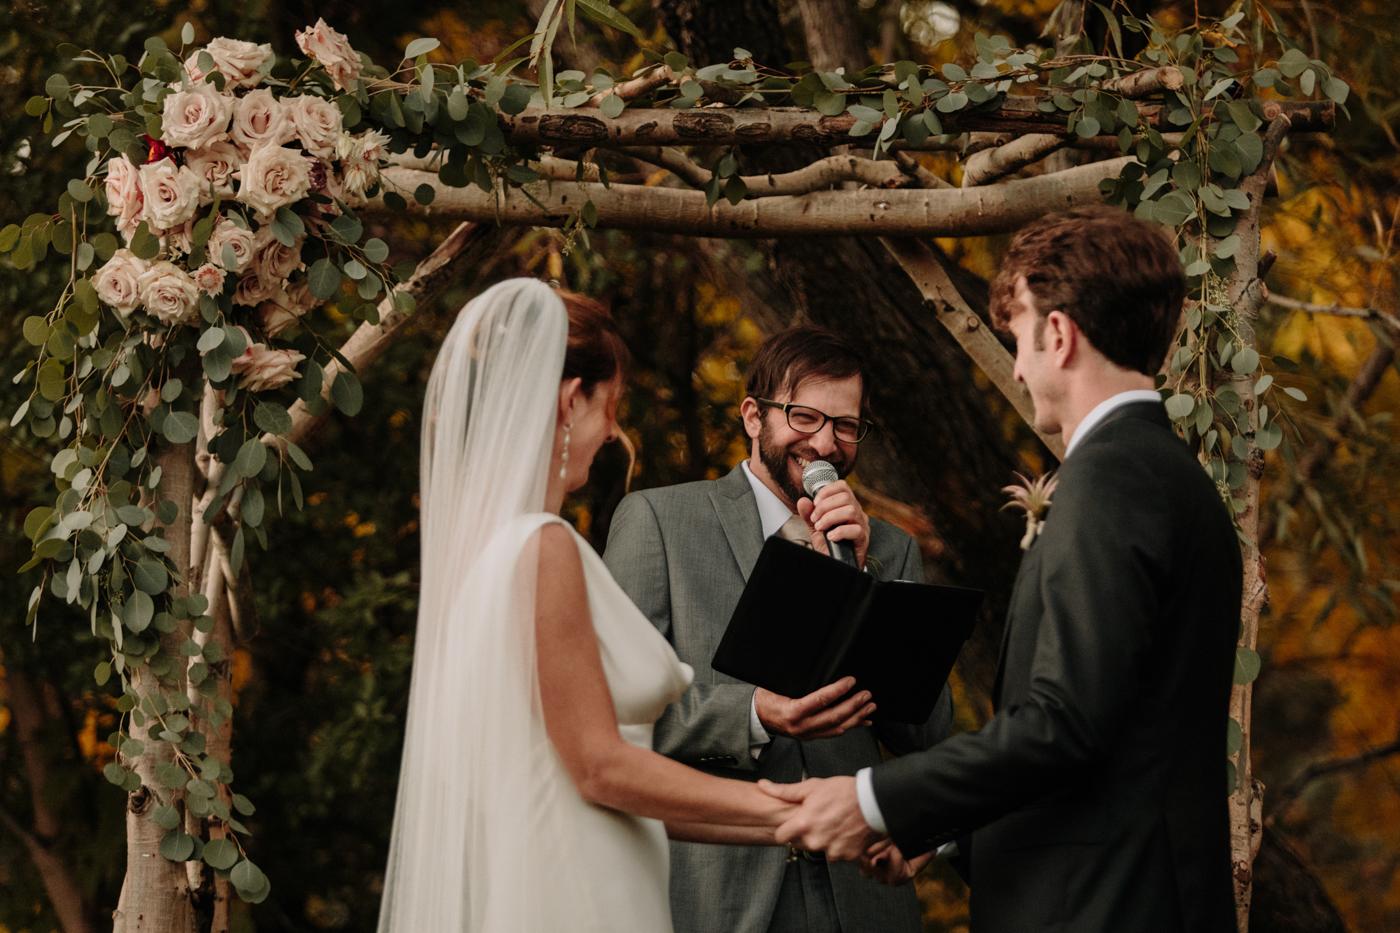 boulder-museum-modern-art-colorado-wedding-64.jpg